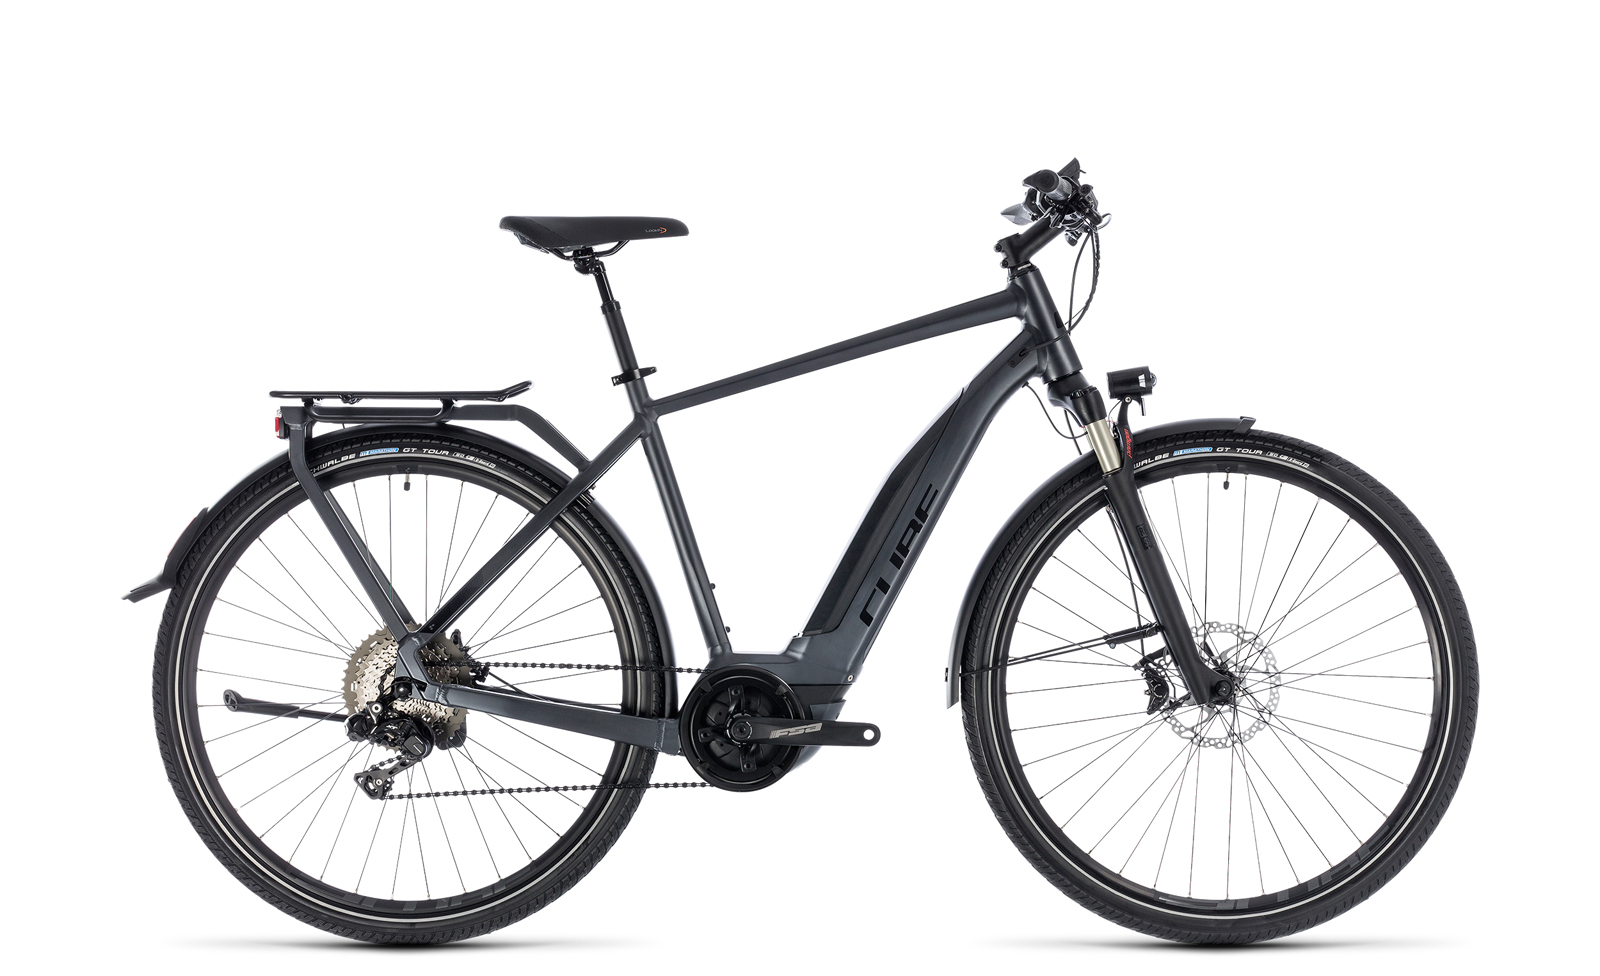 cube touring hybrid sl 500 herren trekking pedelec e bike fahrrad grau rot 2018 von top marken. Black Bedroom Furniture Sets. Home Design Ideas